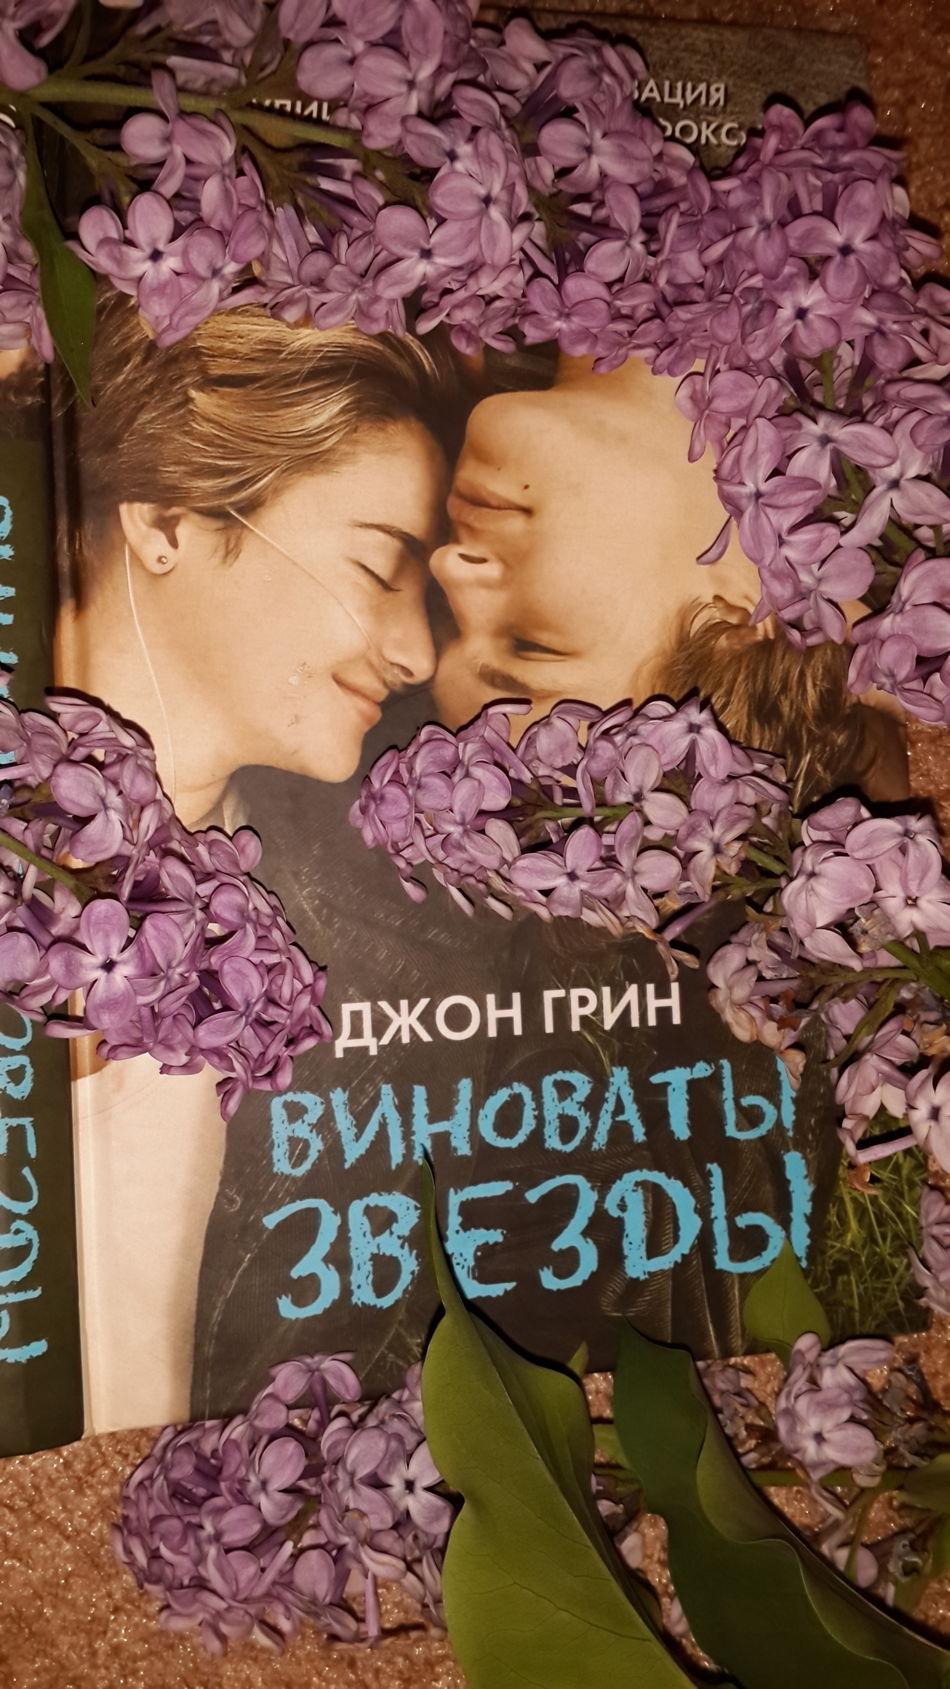 ВиноватыЗвезды книга Saradyuss литература